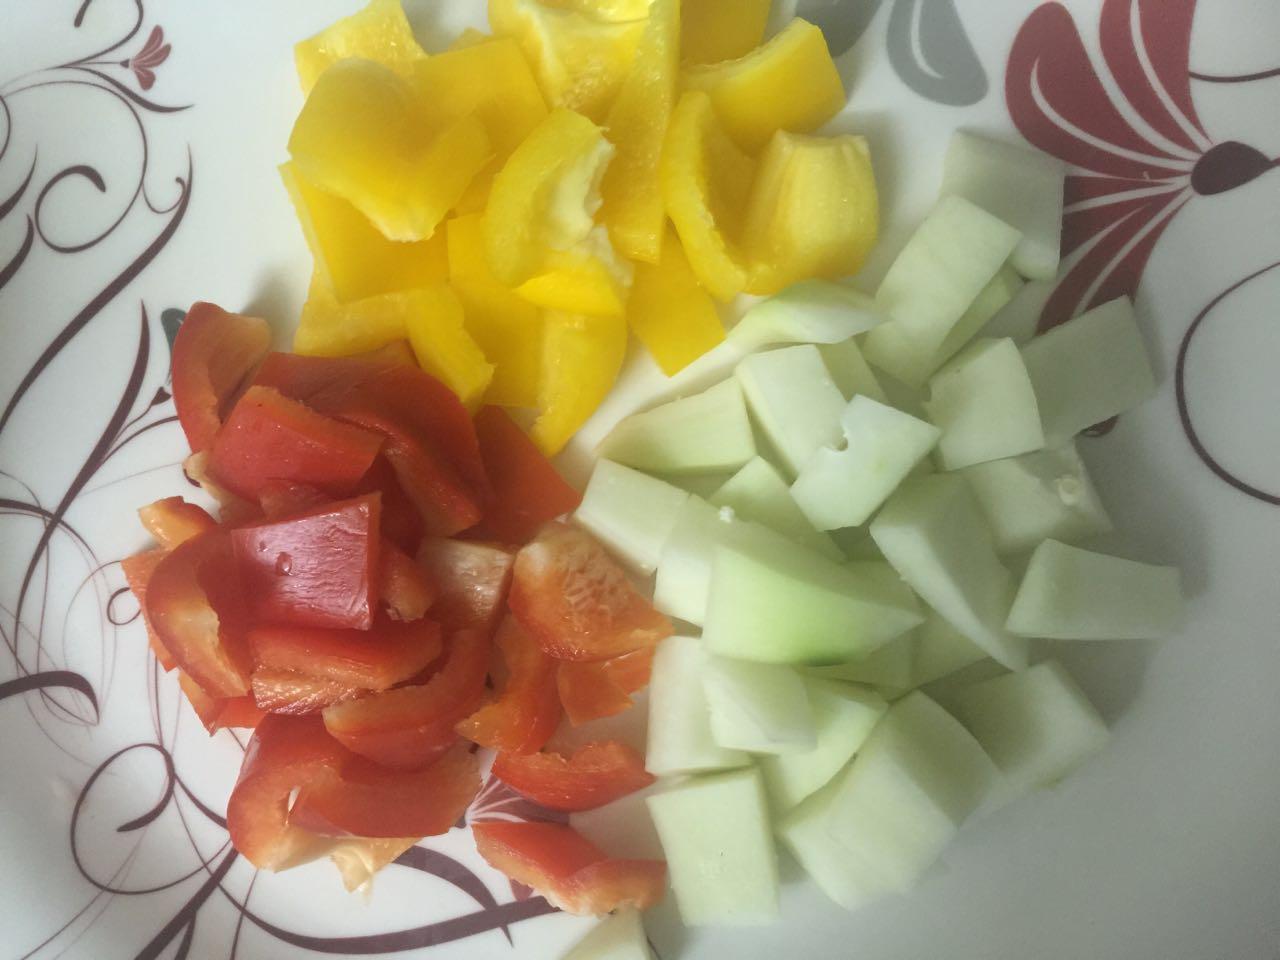 Sample bulking diet meal plan